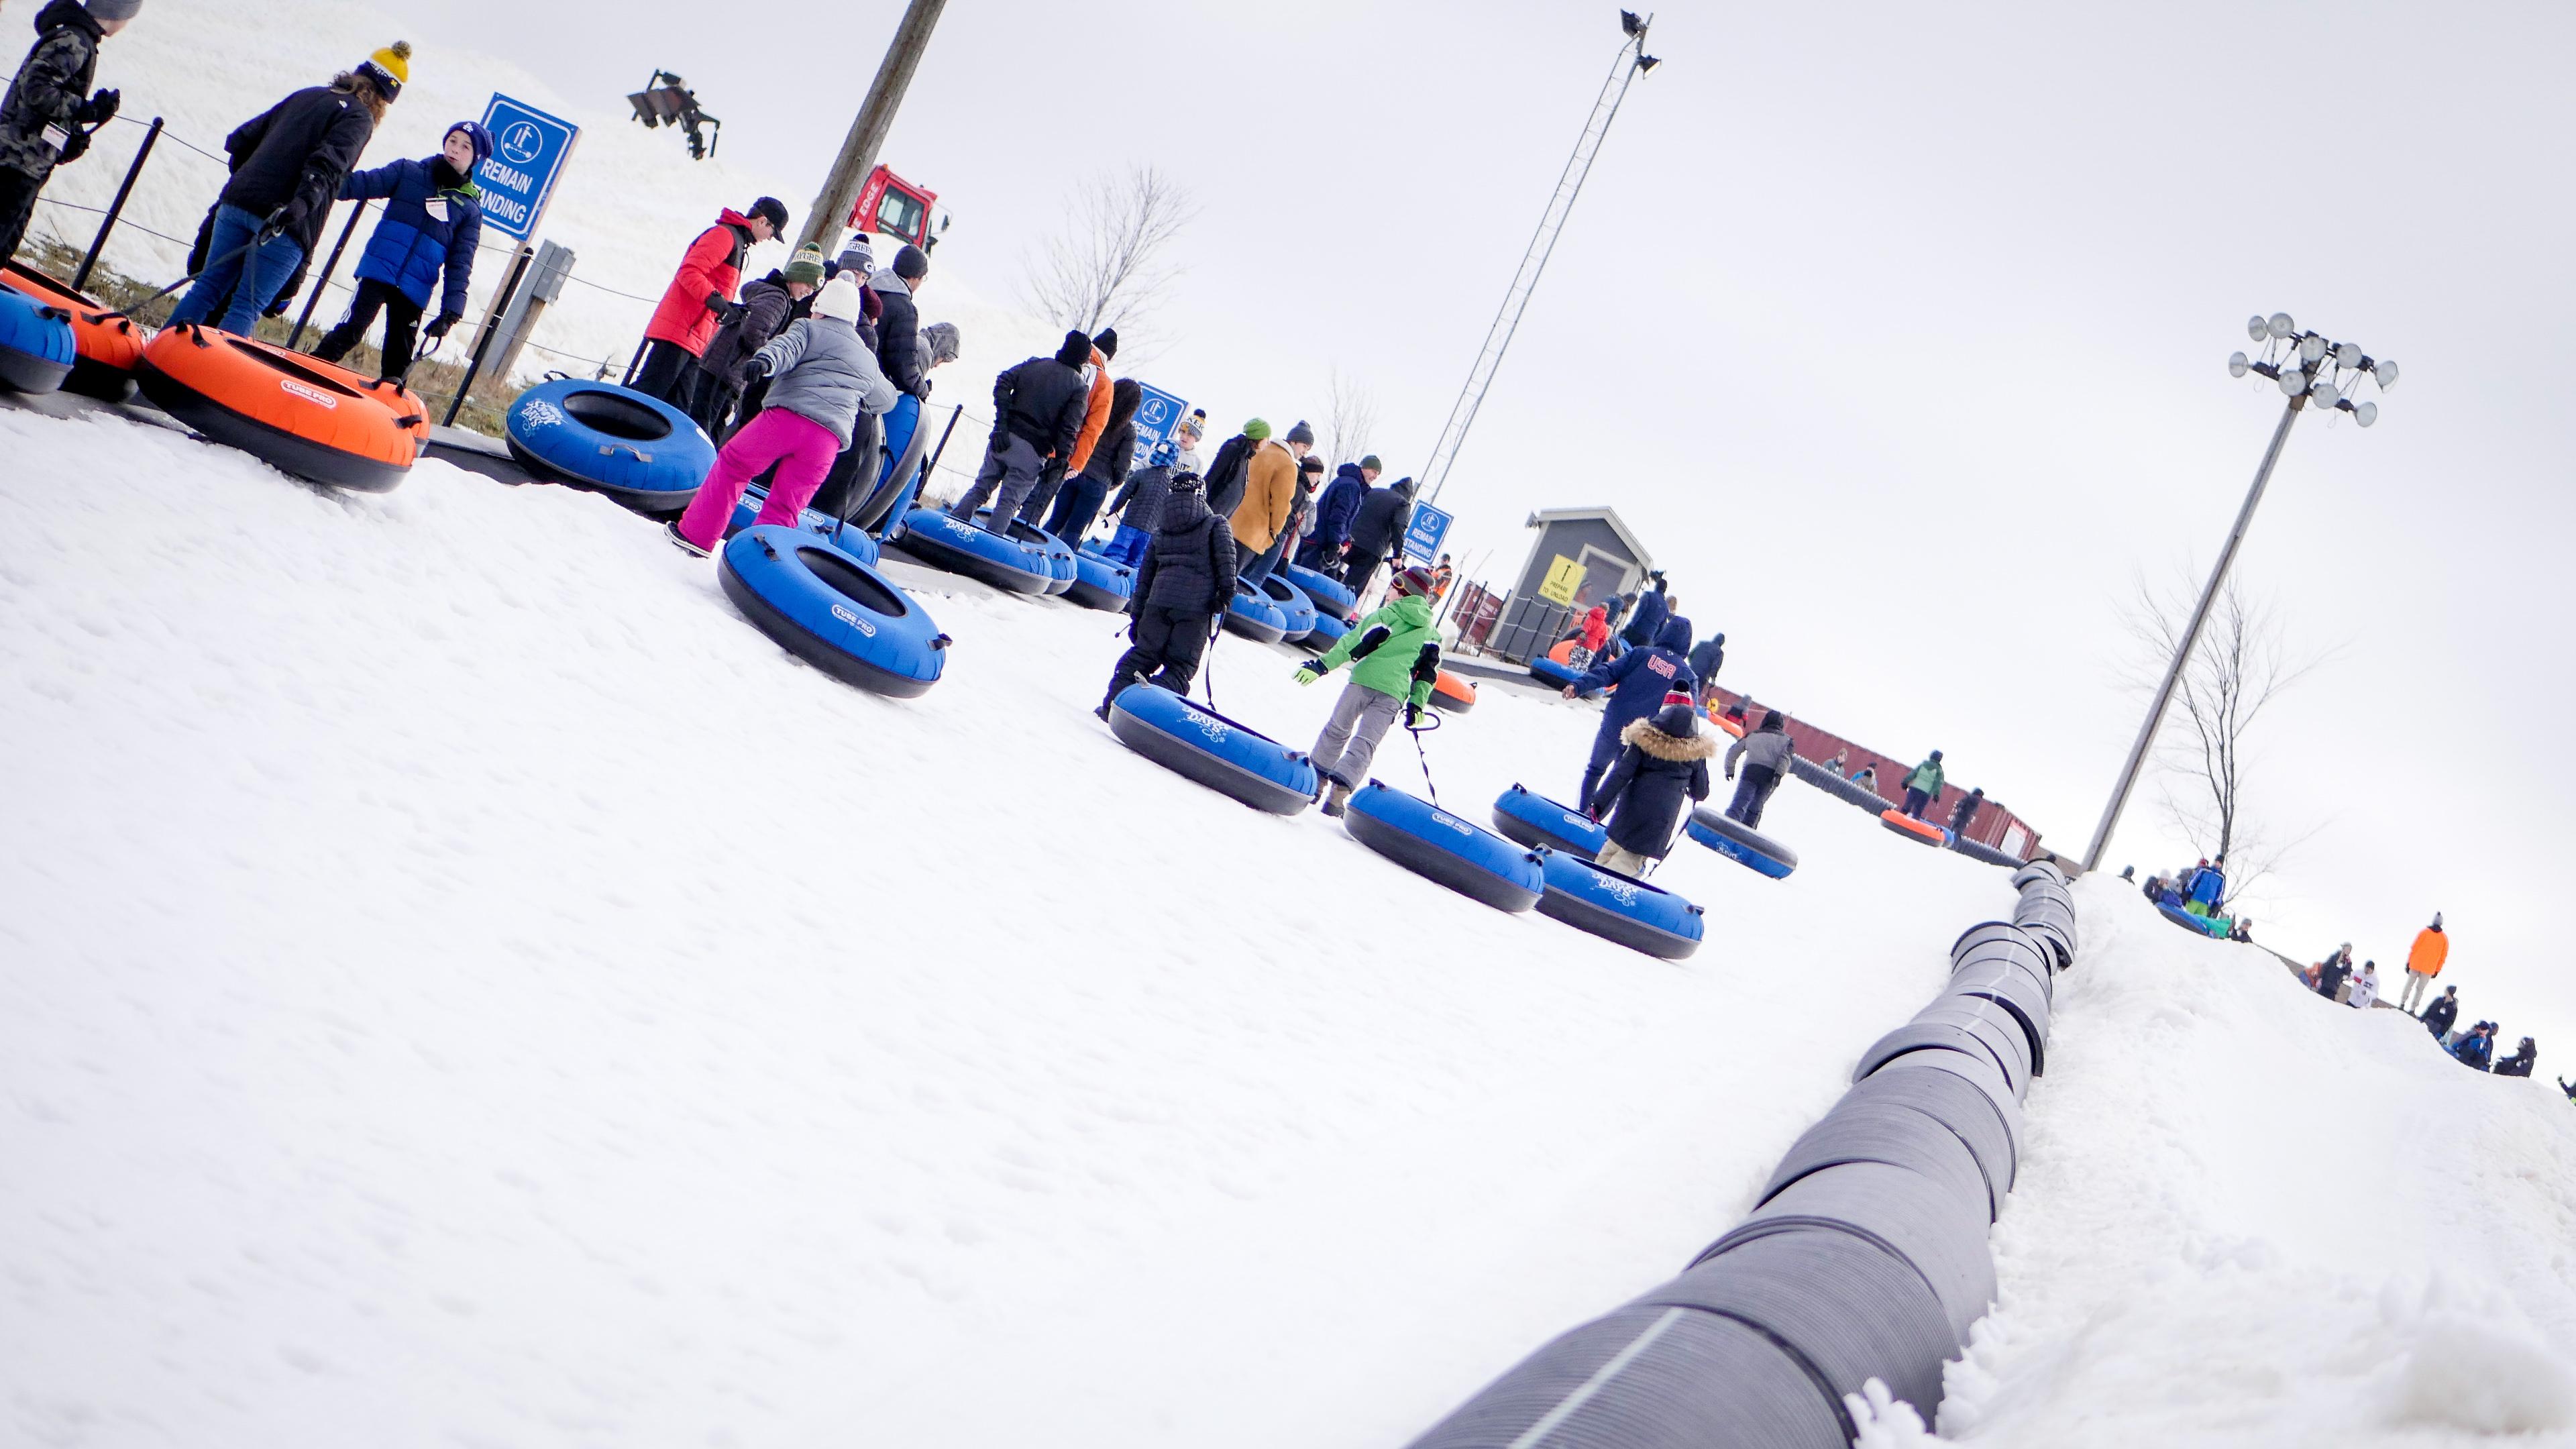 Snow Tubing At The Rock Snowpark